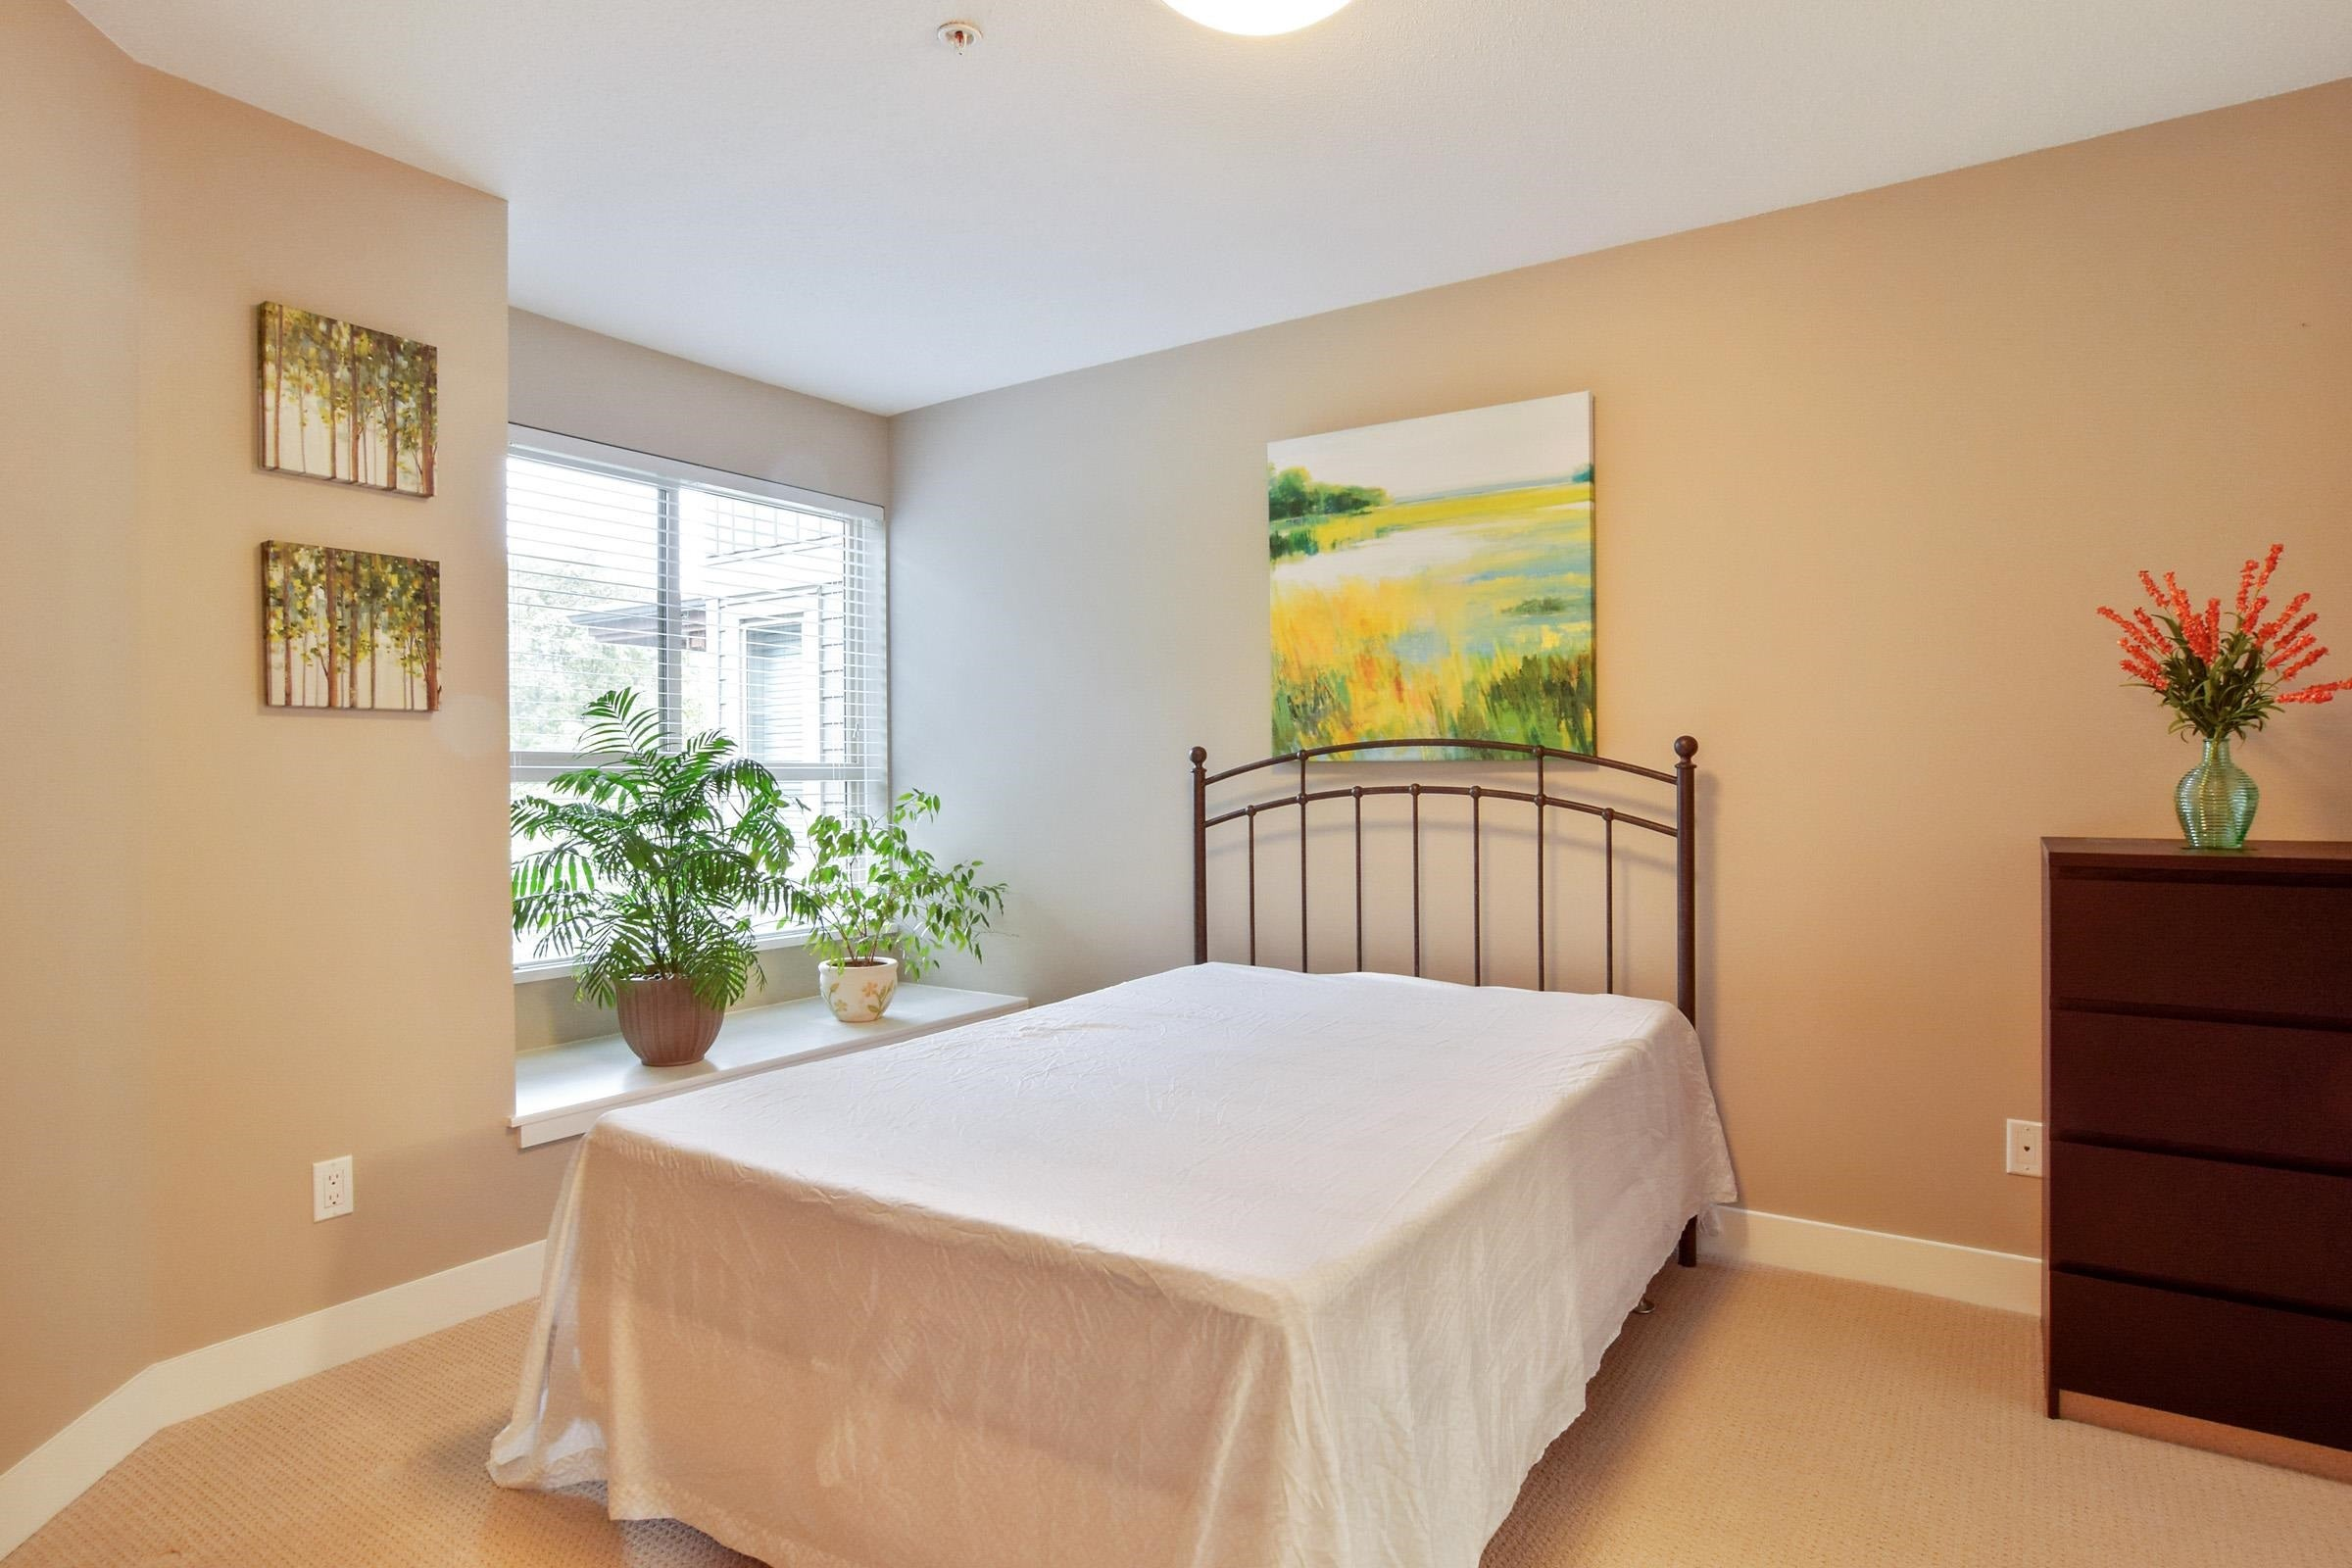 301 7131 STRIDE AVENUE - Edmonds BE Apartment/Condo for sale, 1 Bedroom (R2625669) - #9